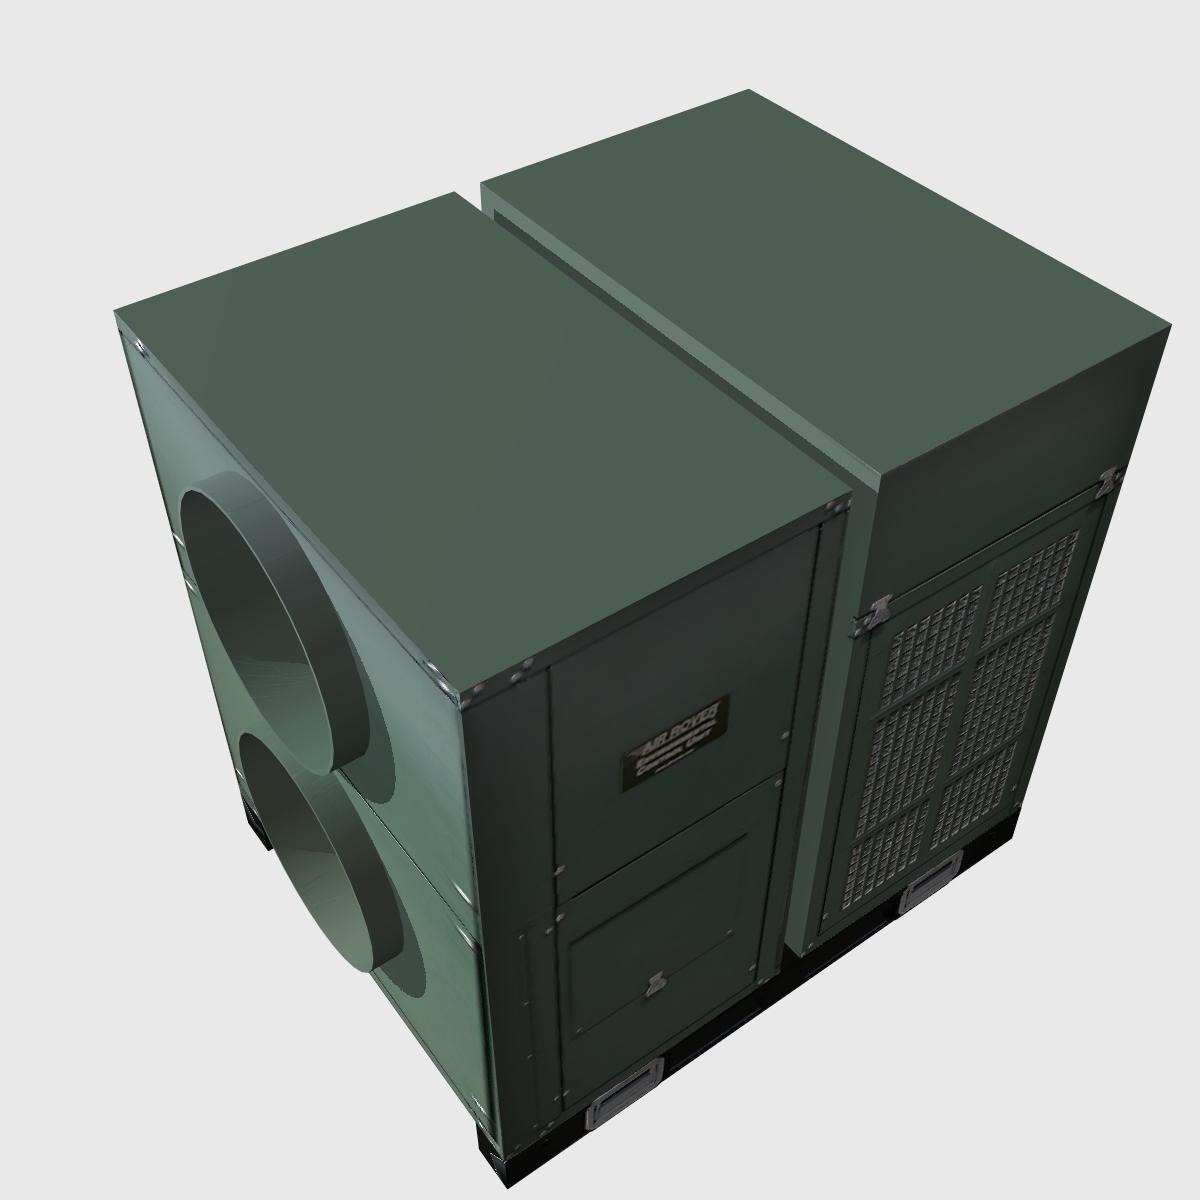 hvac air rover unit 3d model 3ds dxf cob x obj 153094